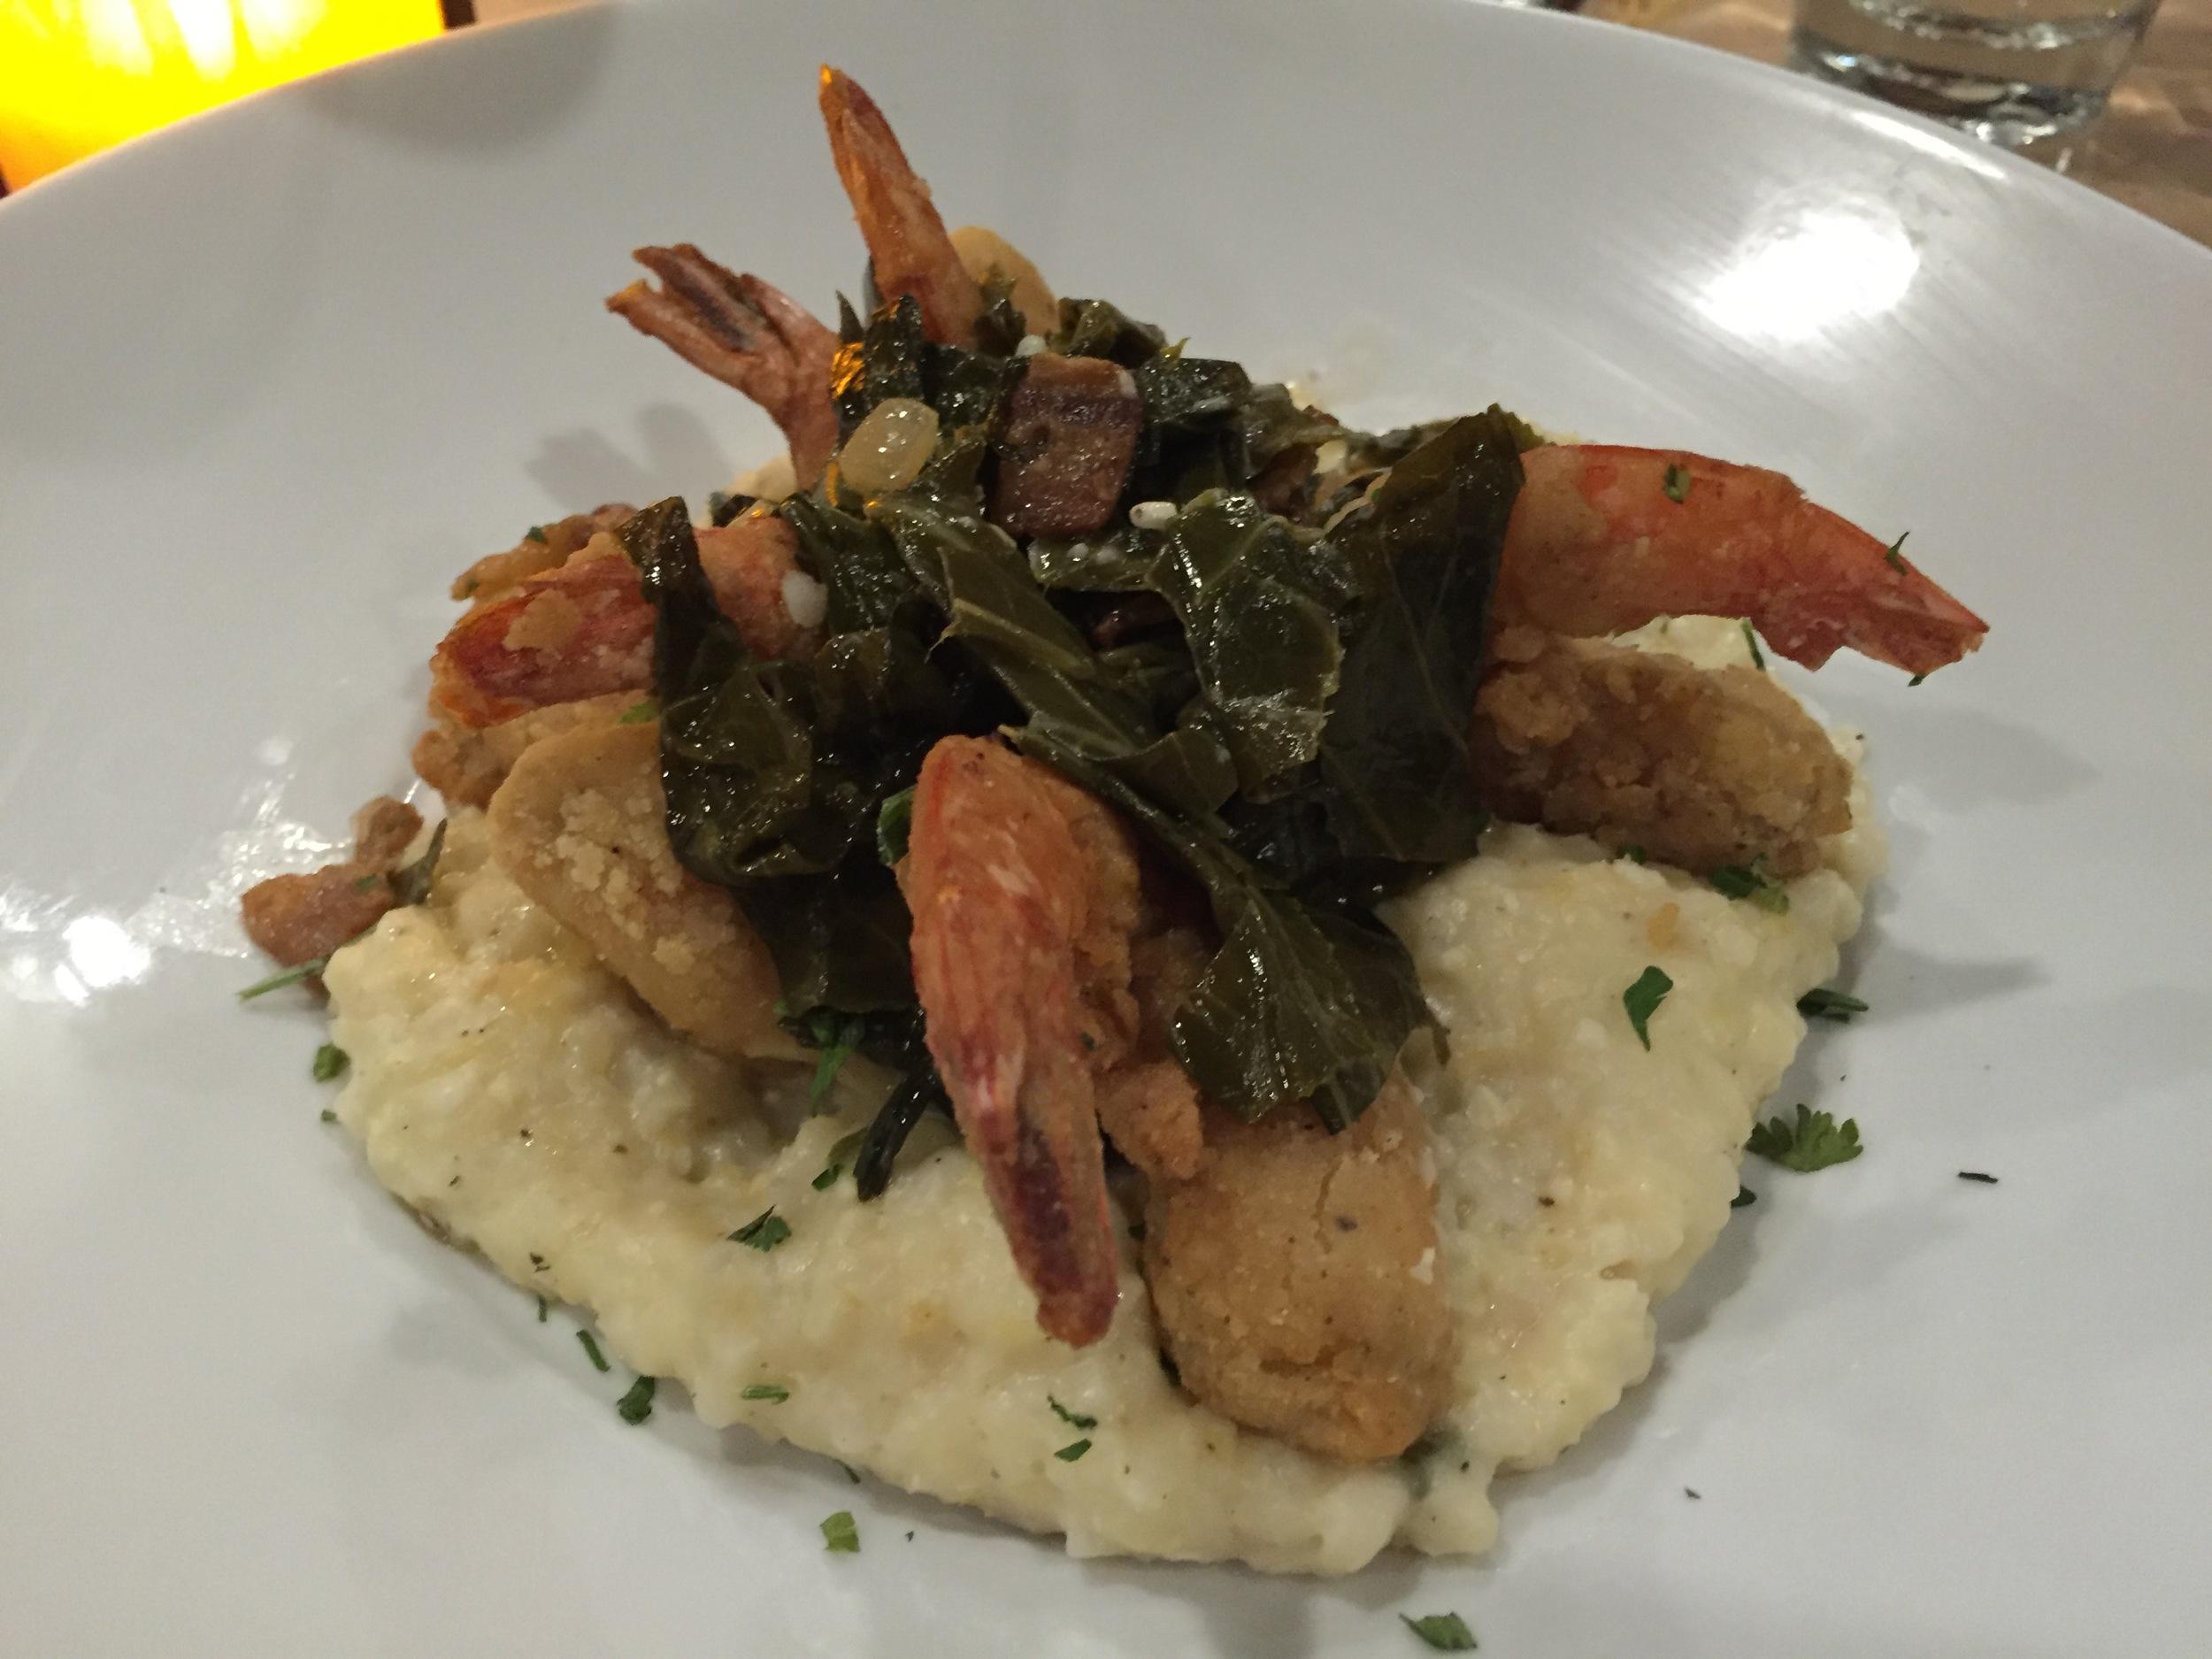 Southern Fried Shrimp & Grits